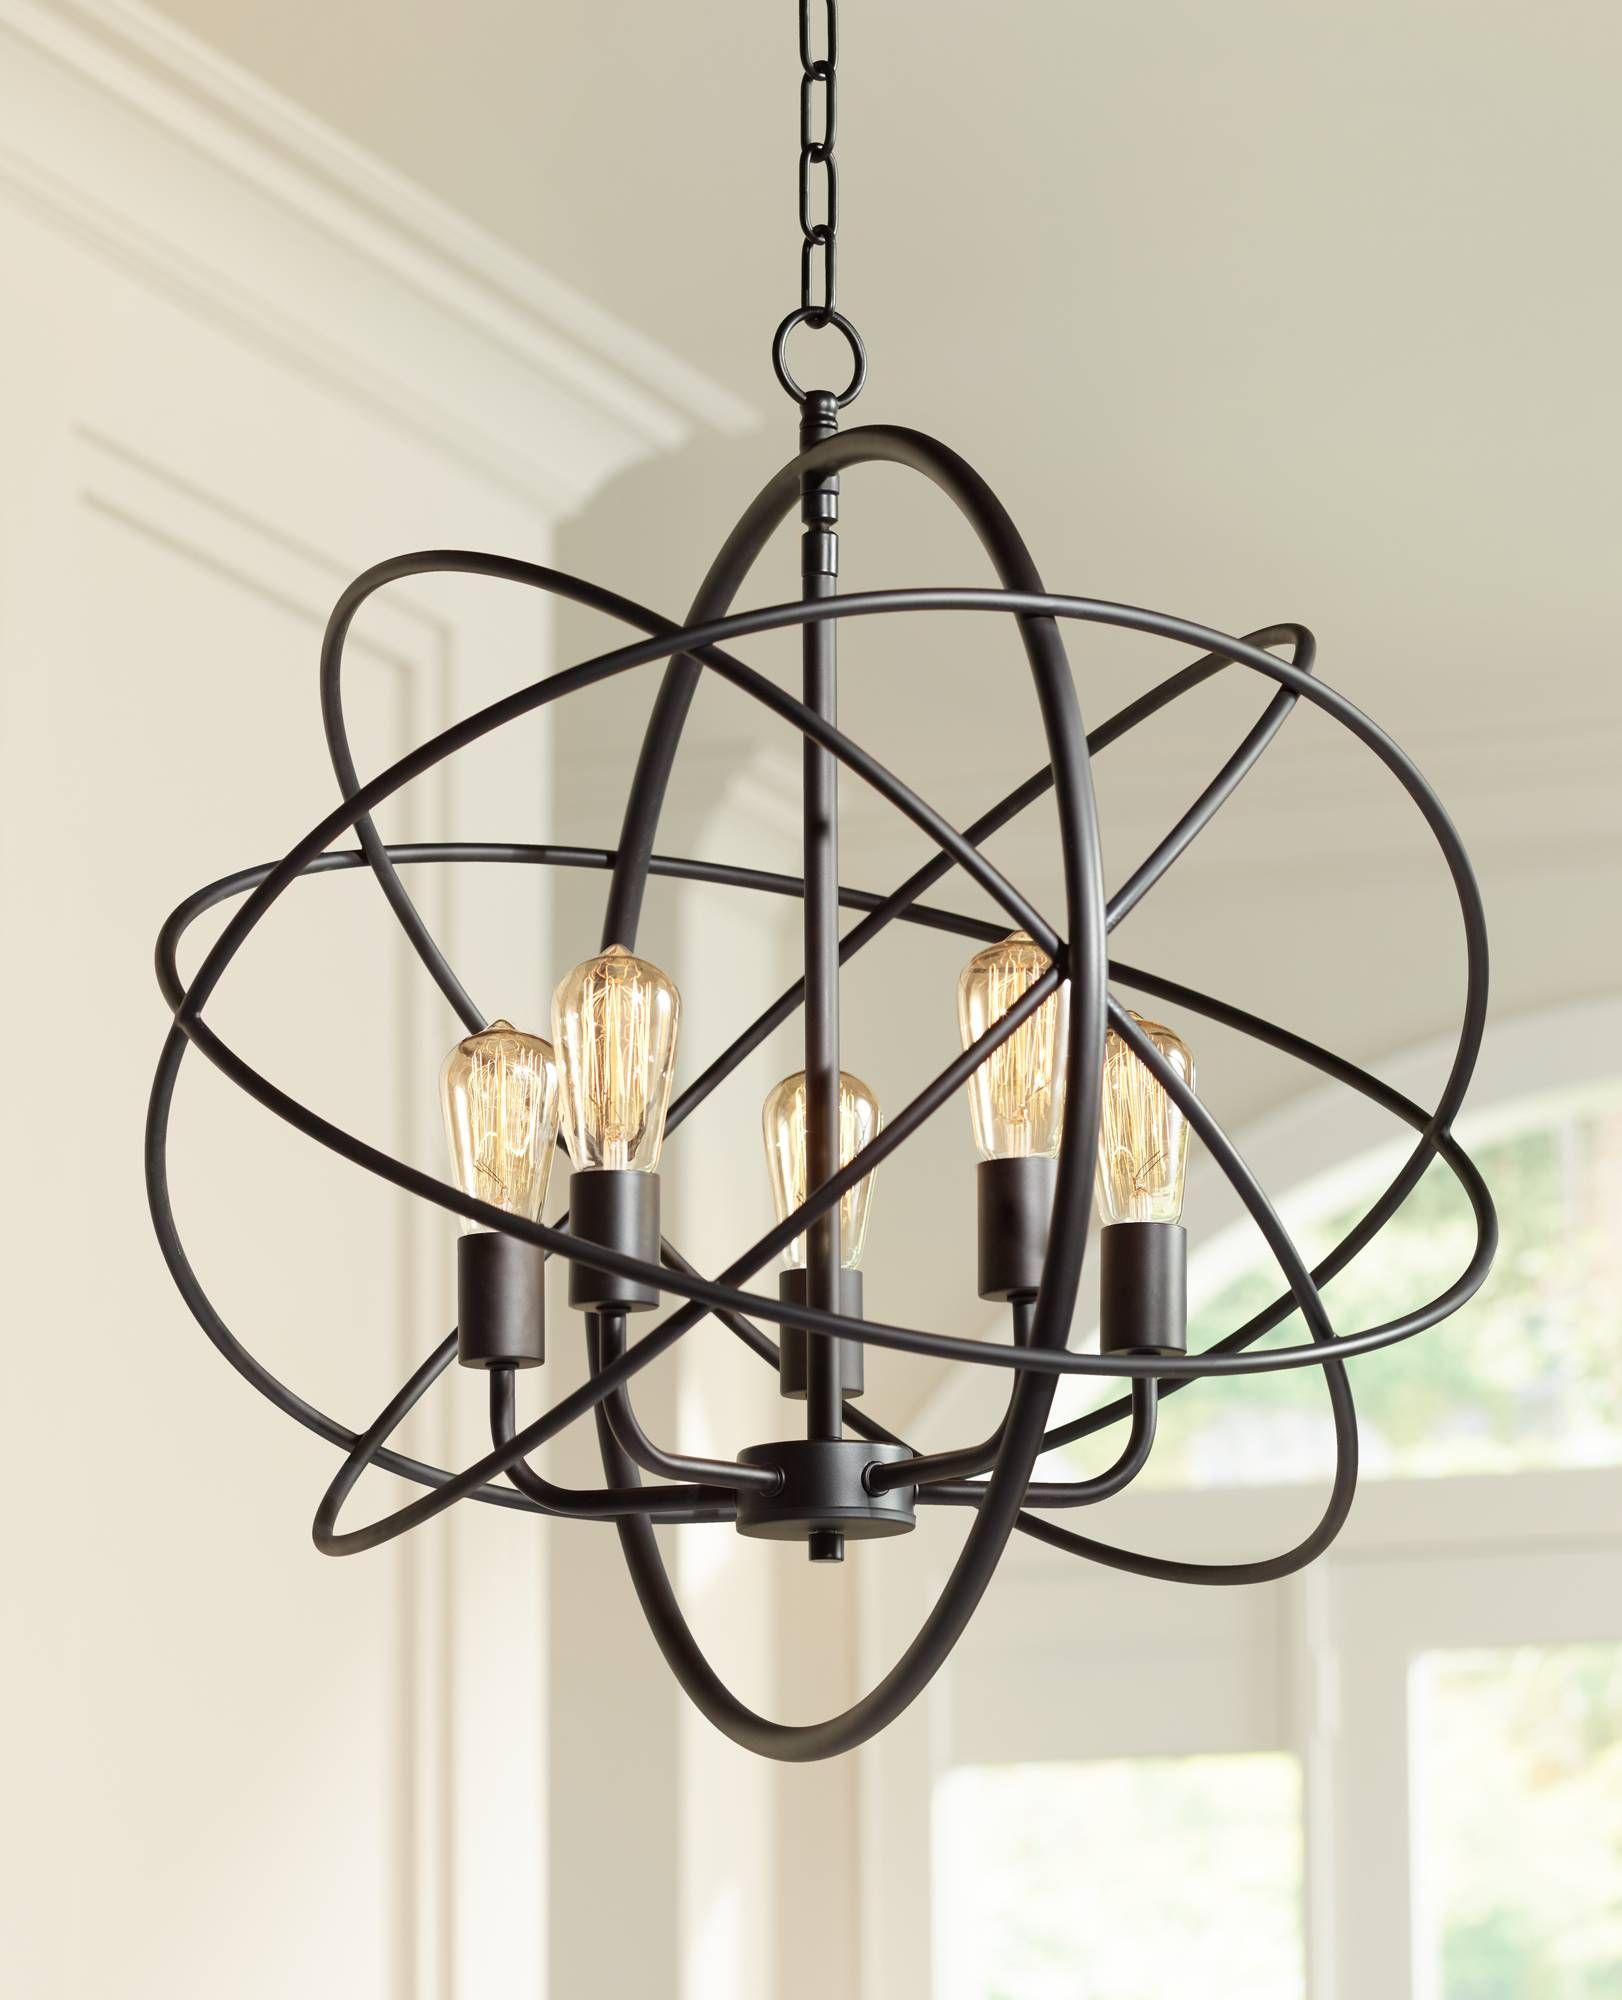 Ellery 24 3 4 Wide 5 Light Bronze Sphere Foyer Pendant 8g444 Lamps Plus